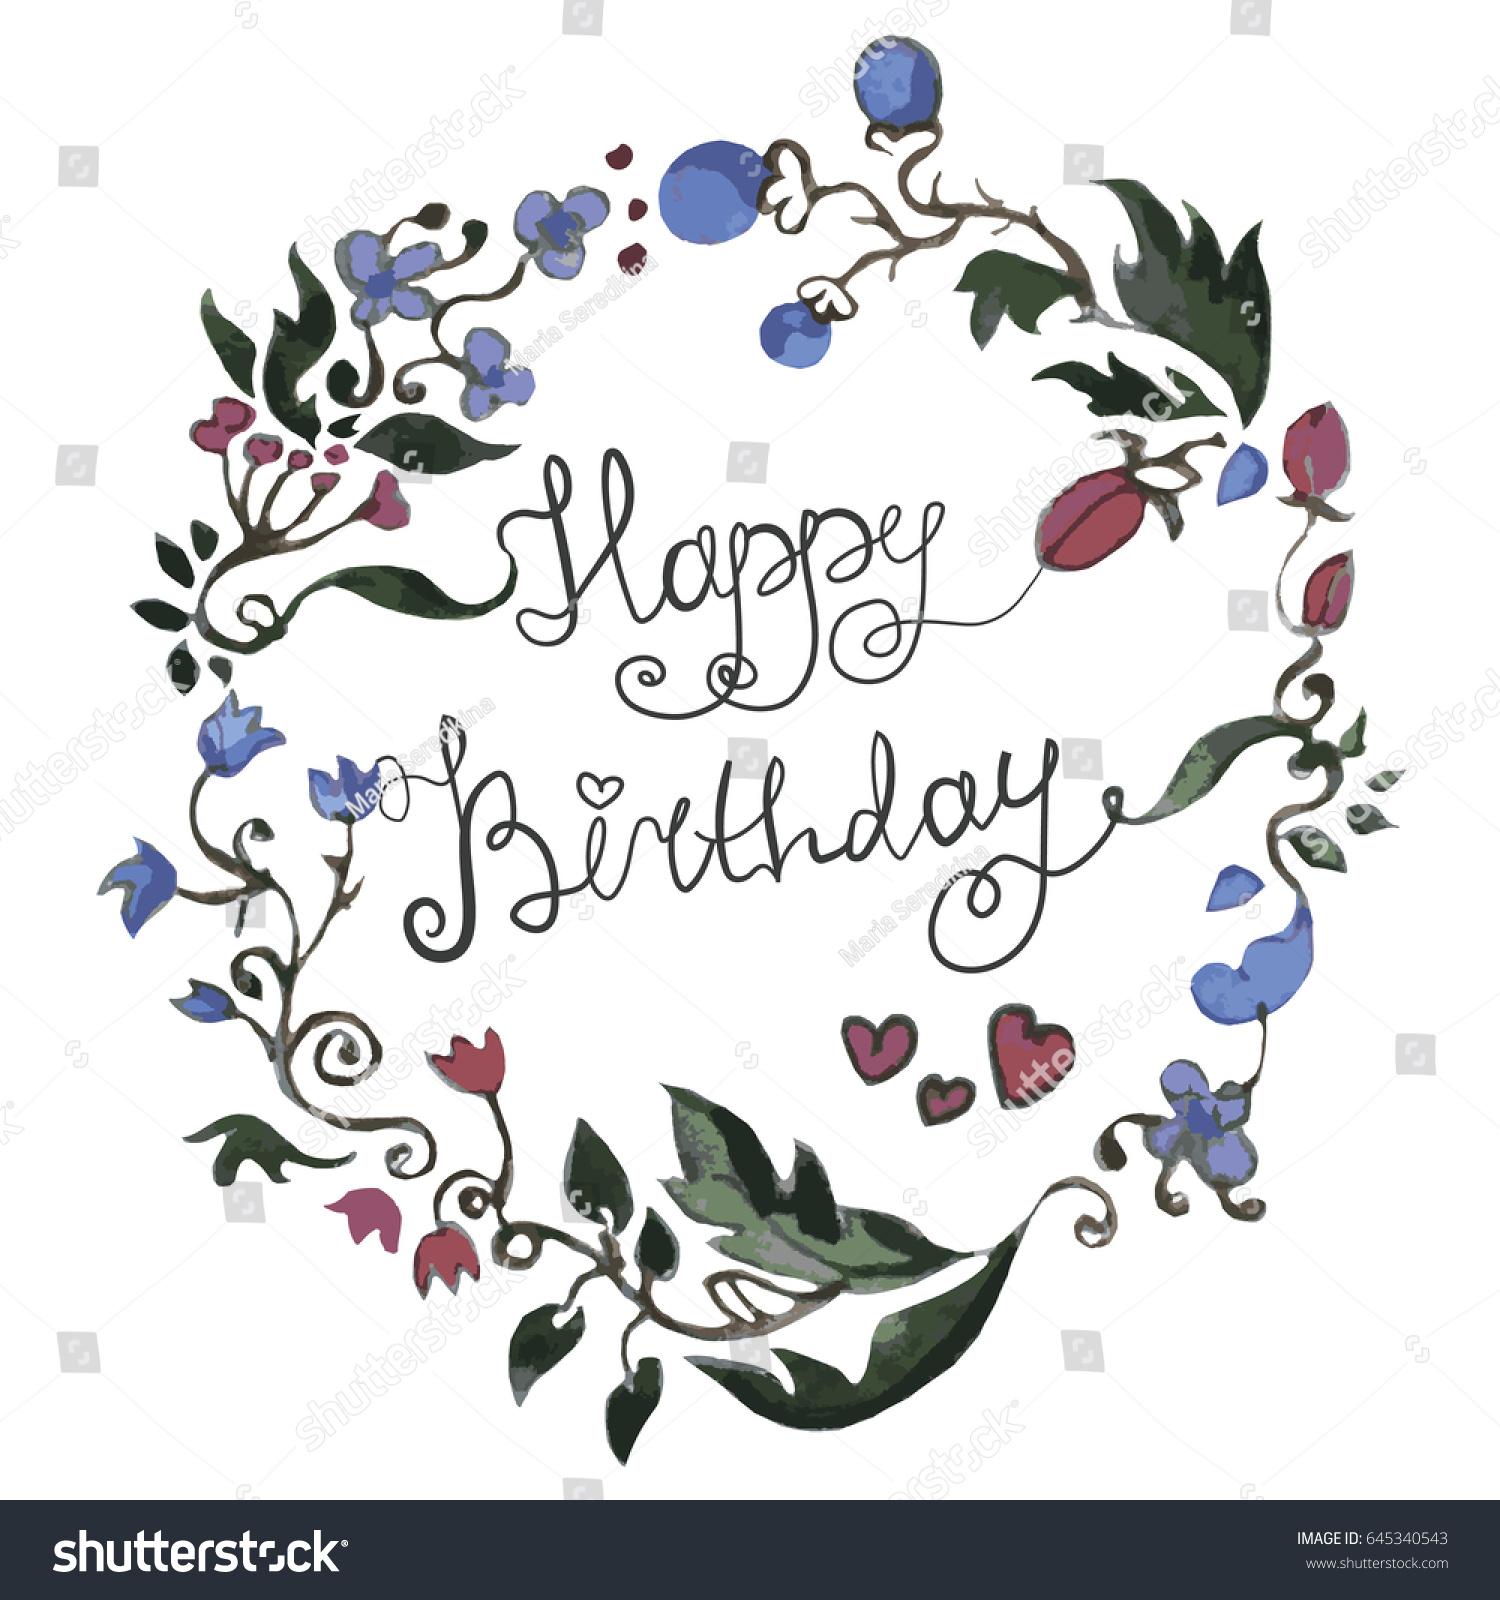 Happy birthday card greeting invitation flower stock vector happy birthday card greeting invitation flower stock vector 645340543 shutterstock stopboris Images